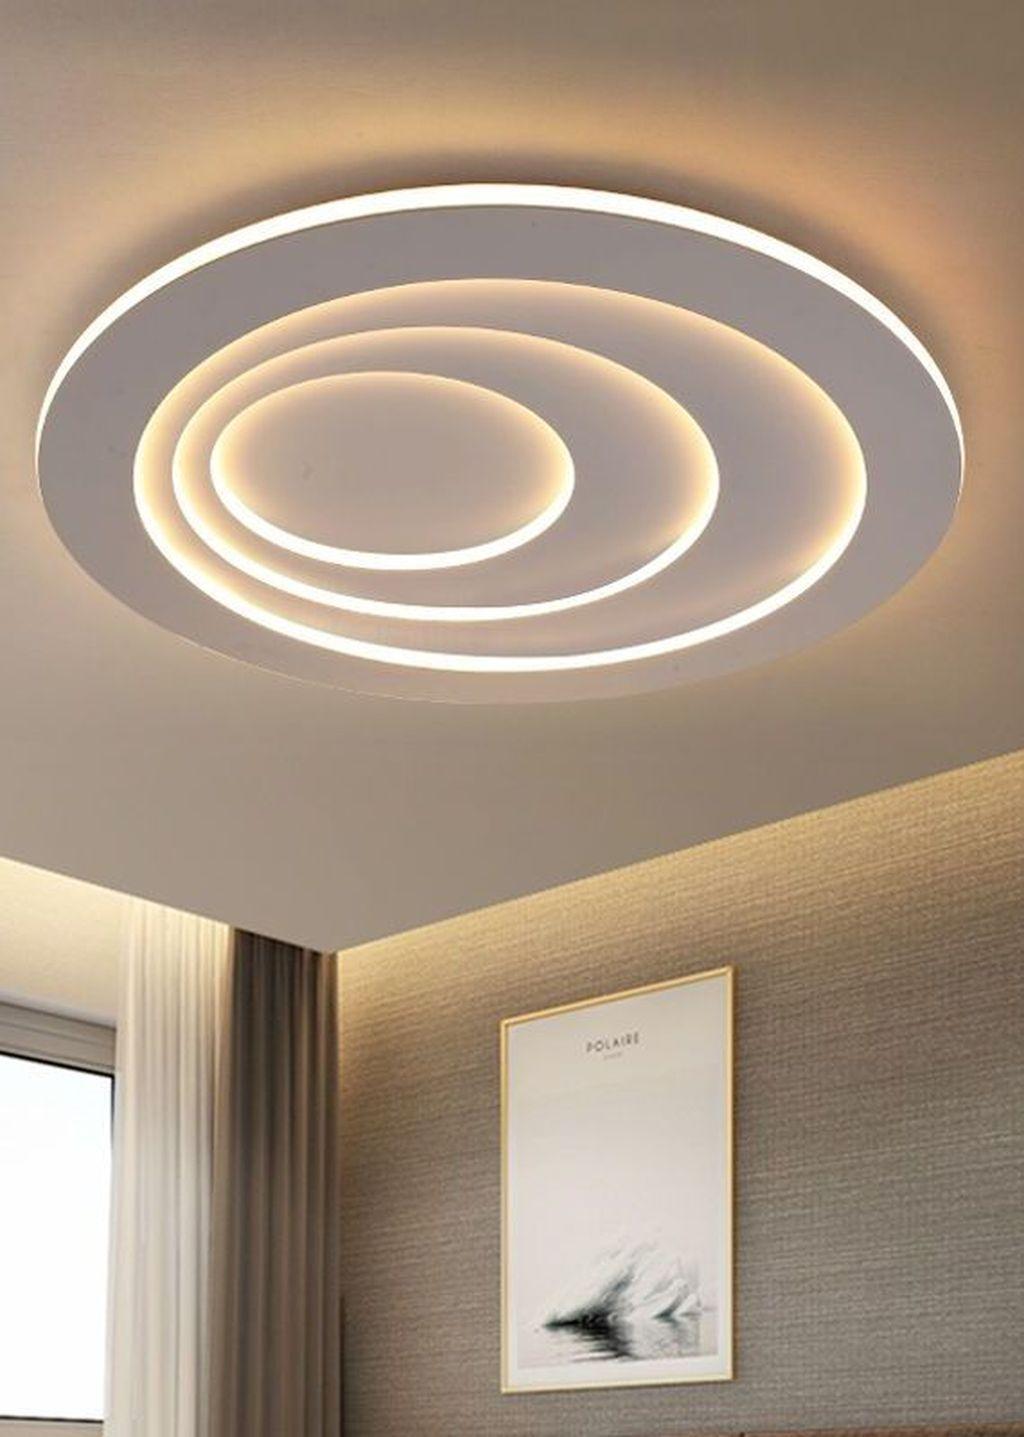 35 Surprising Living Room Design Ideas With Ceiling Light To Have Decoration Plafond Deco Plafond Idees De Plafond